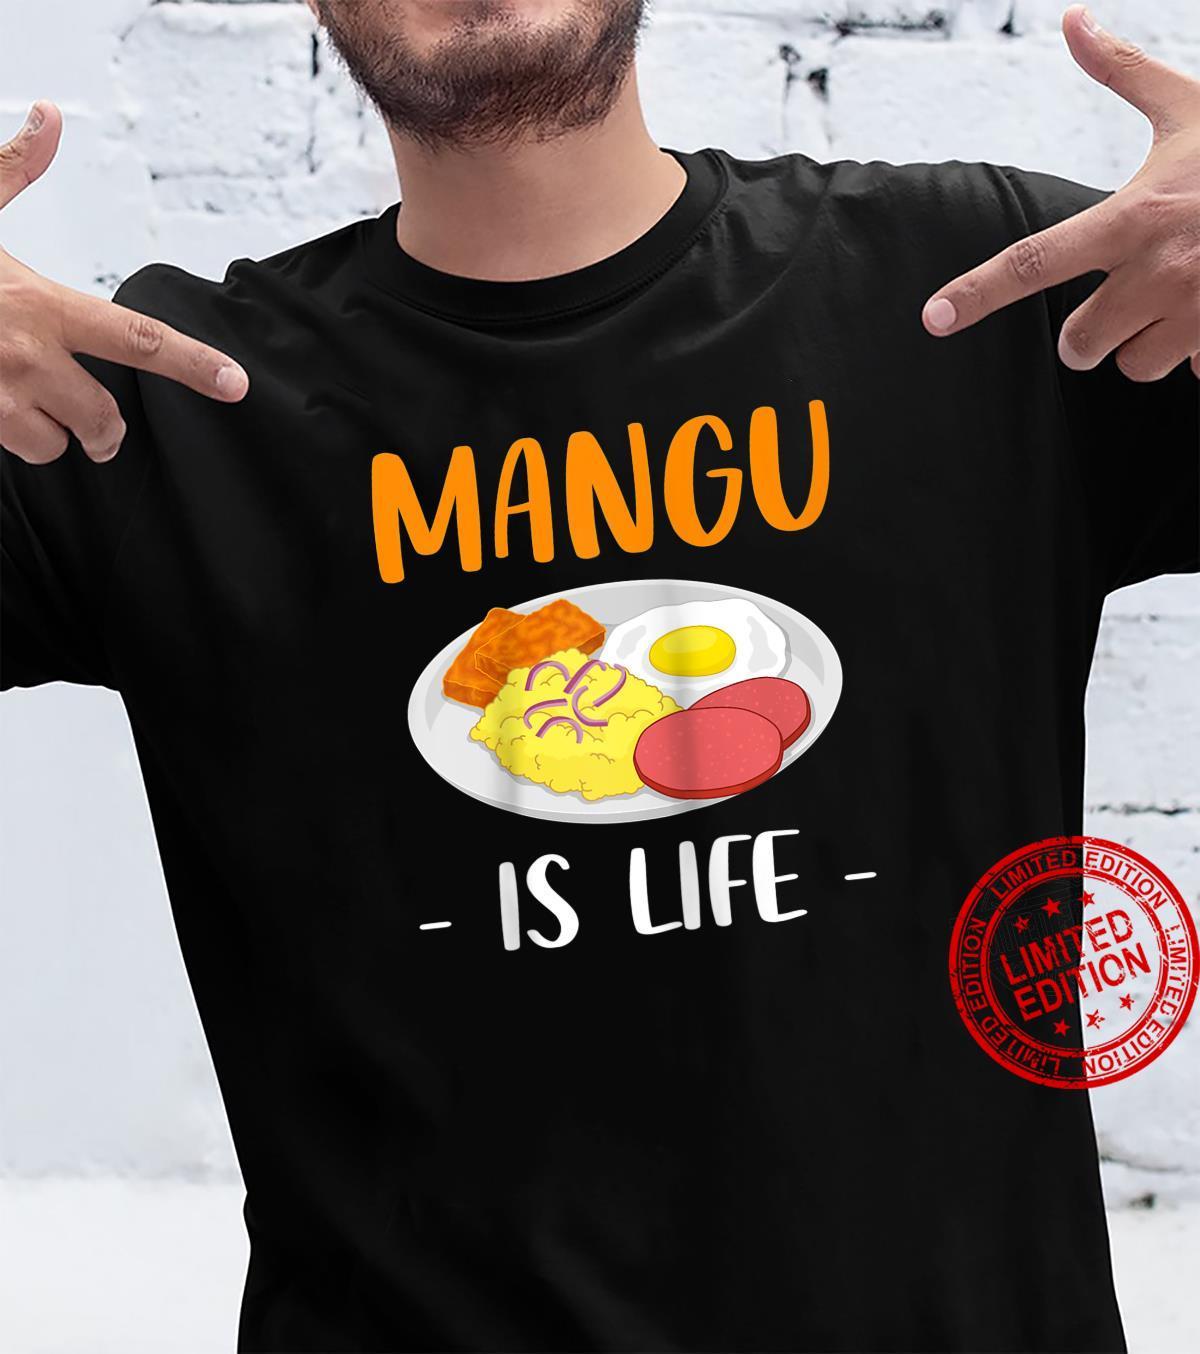 Life Dominican Republic Food Mangu Shirt